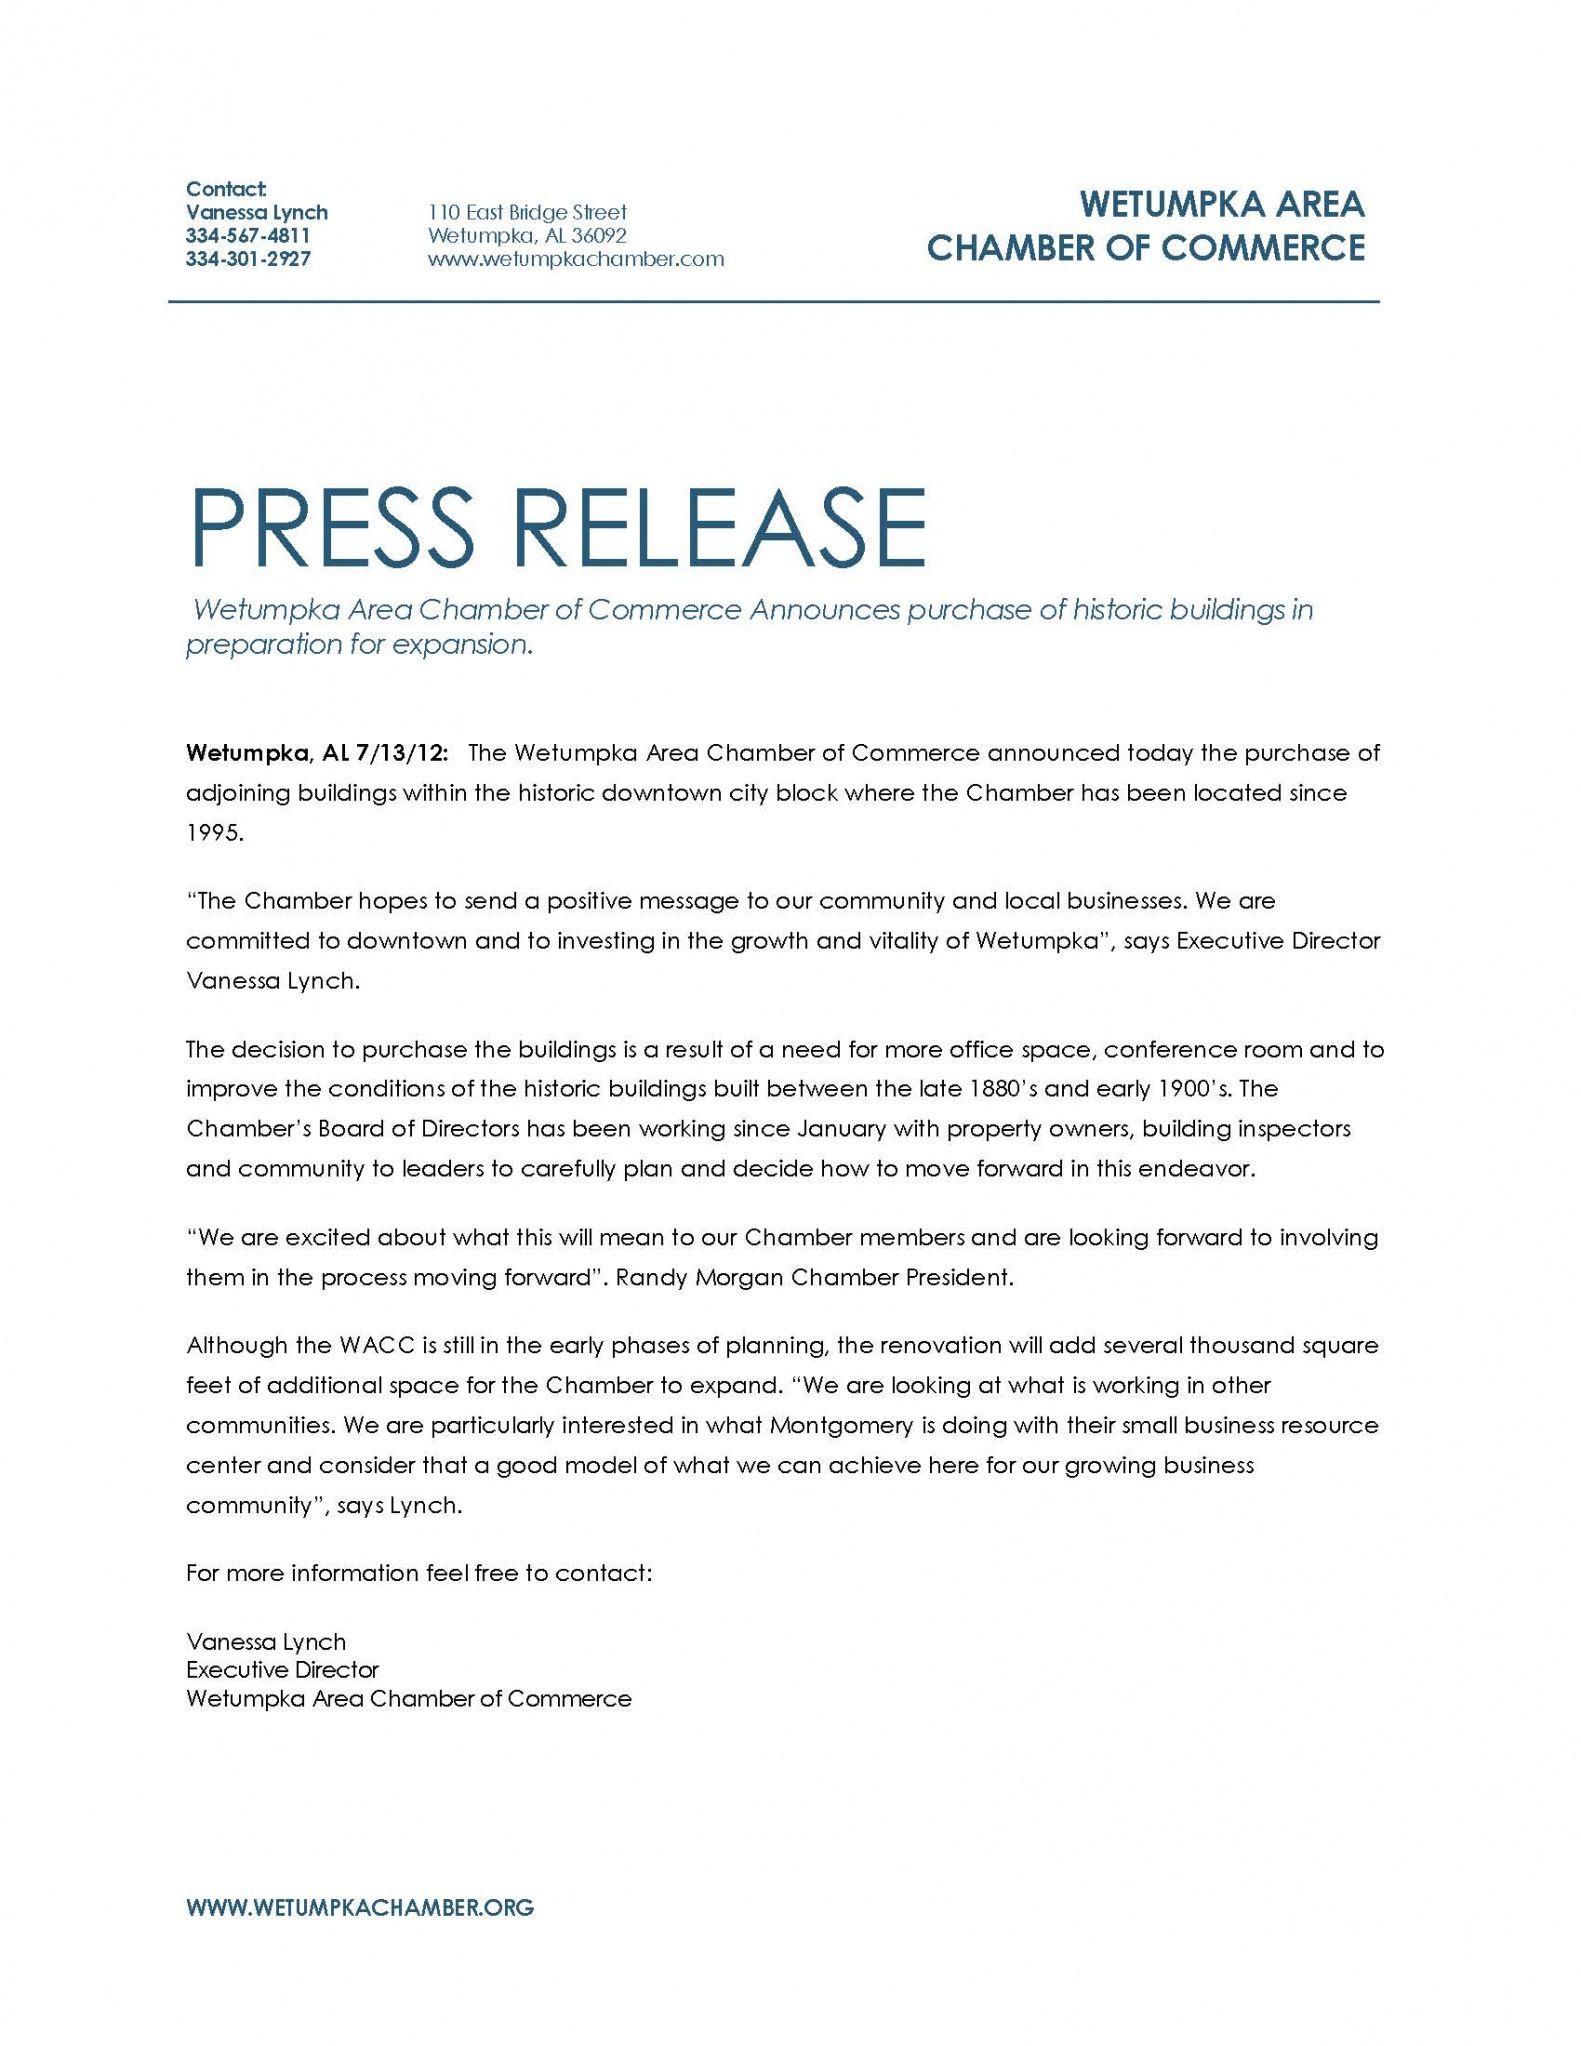 press release template doc  europetripsleepco new board member press release template doc